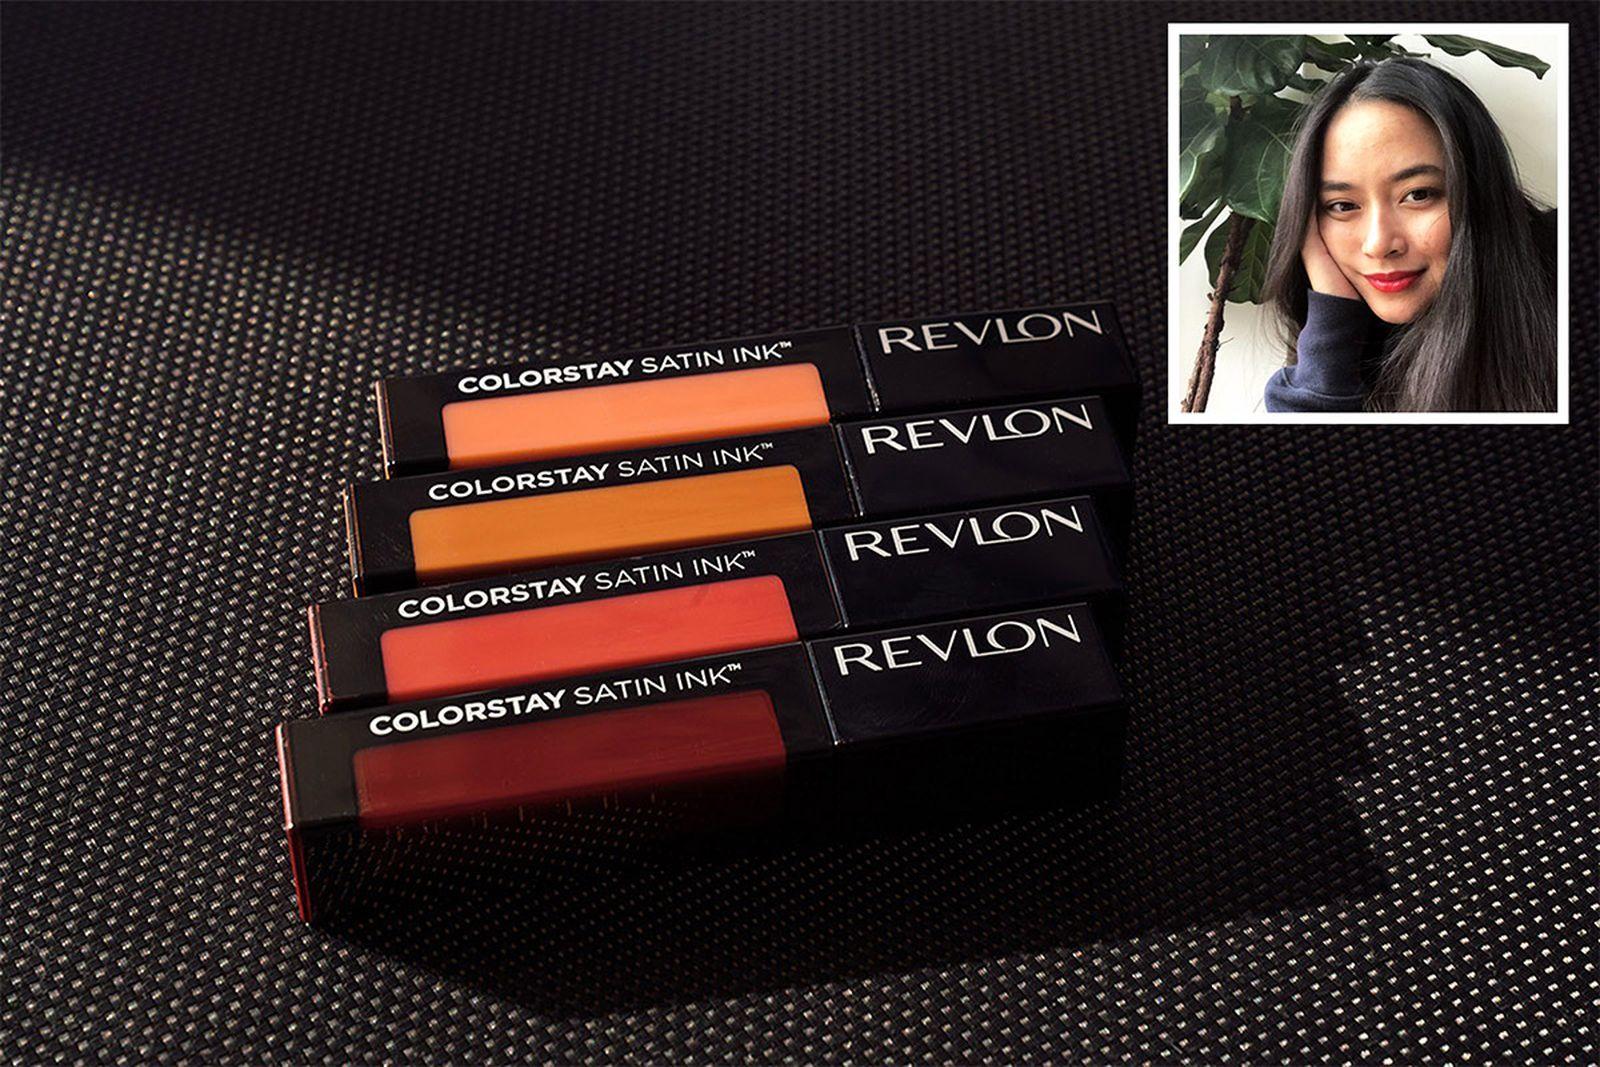 Revlon-01